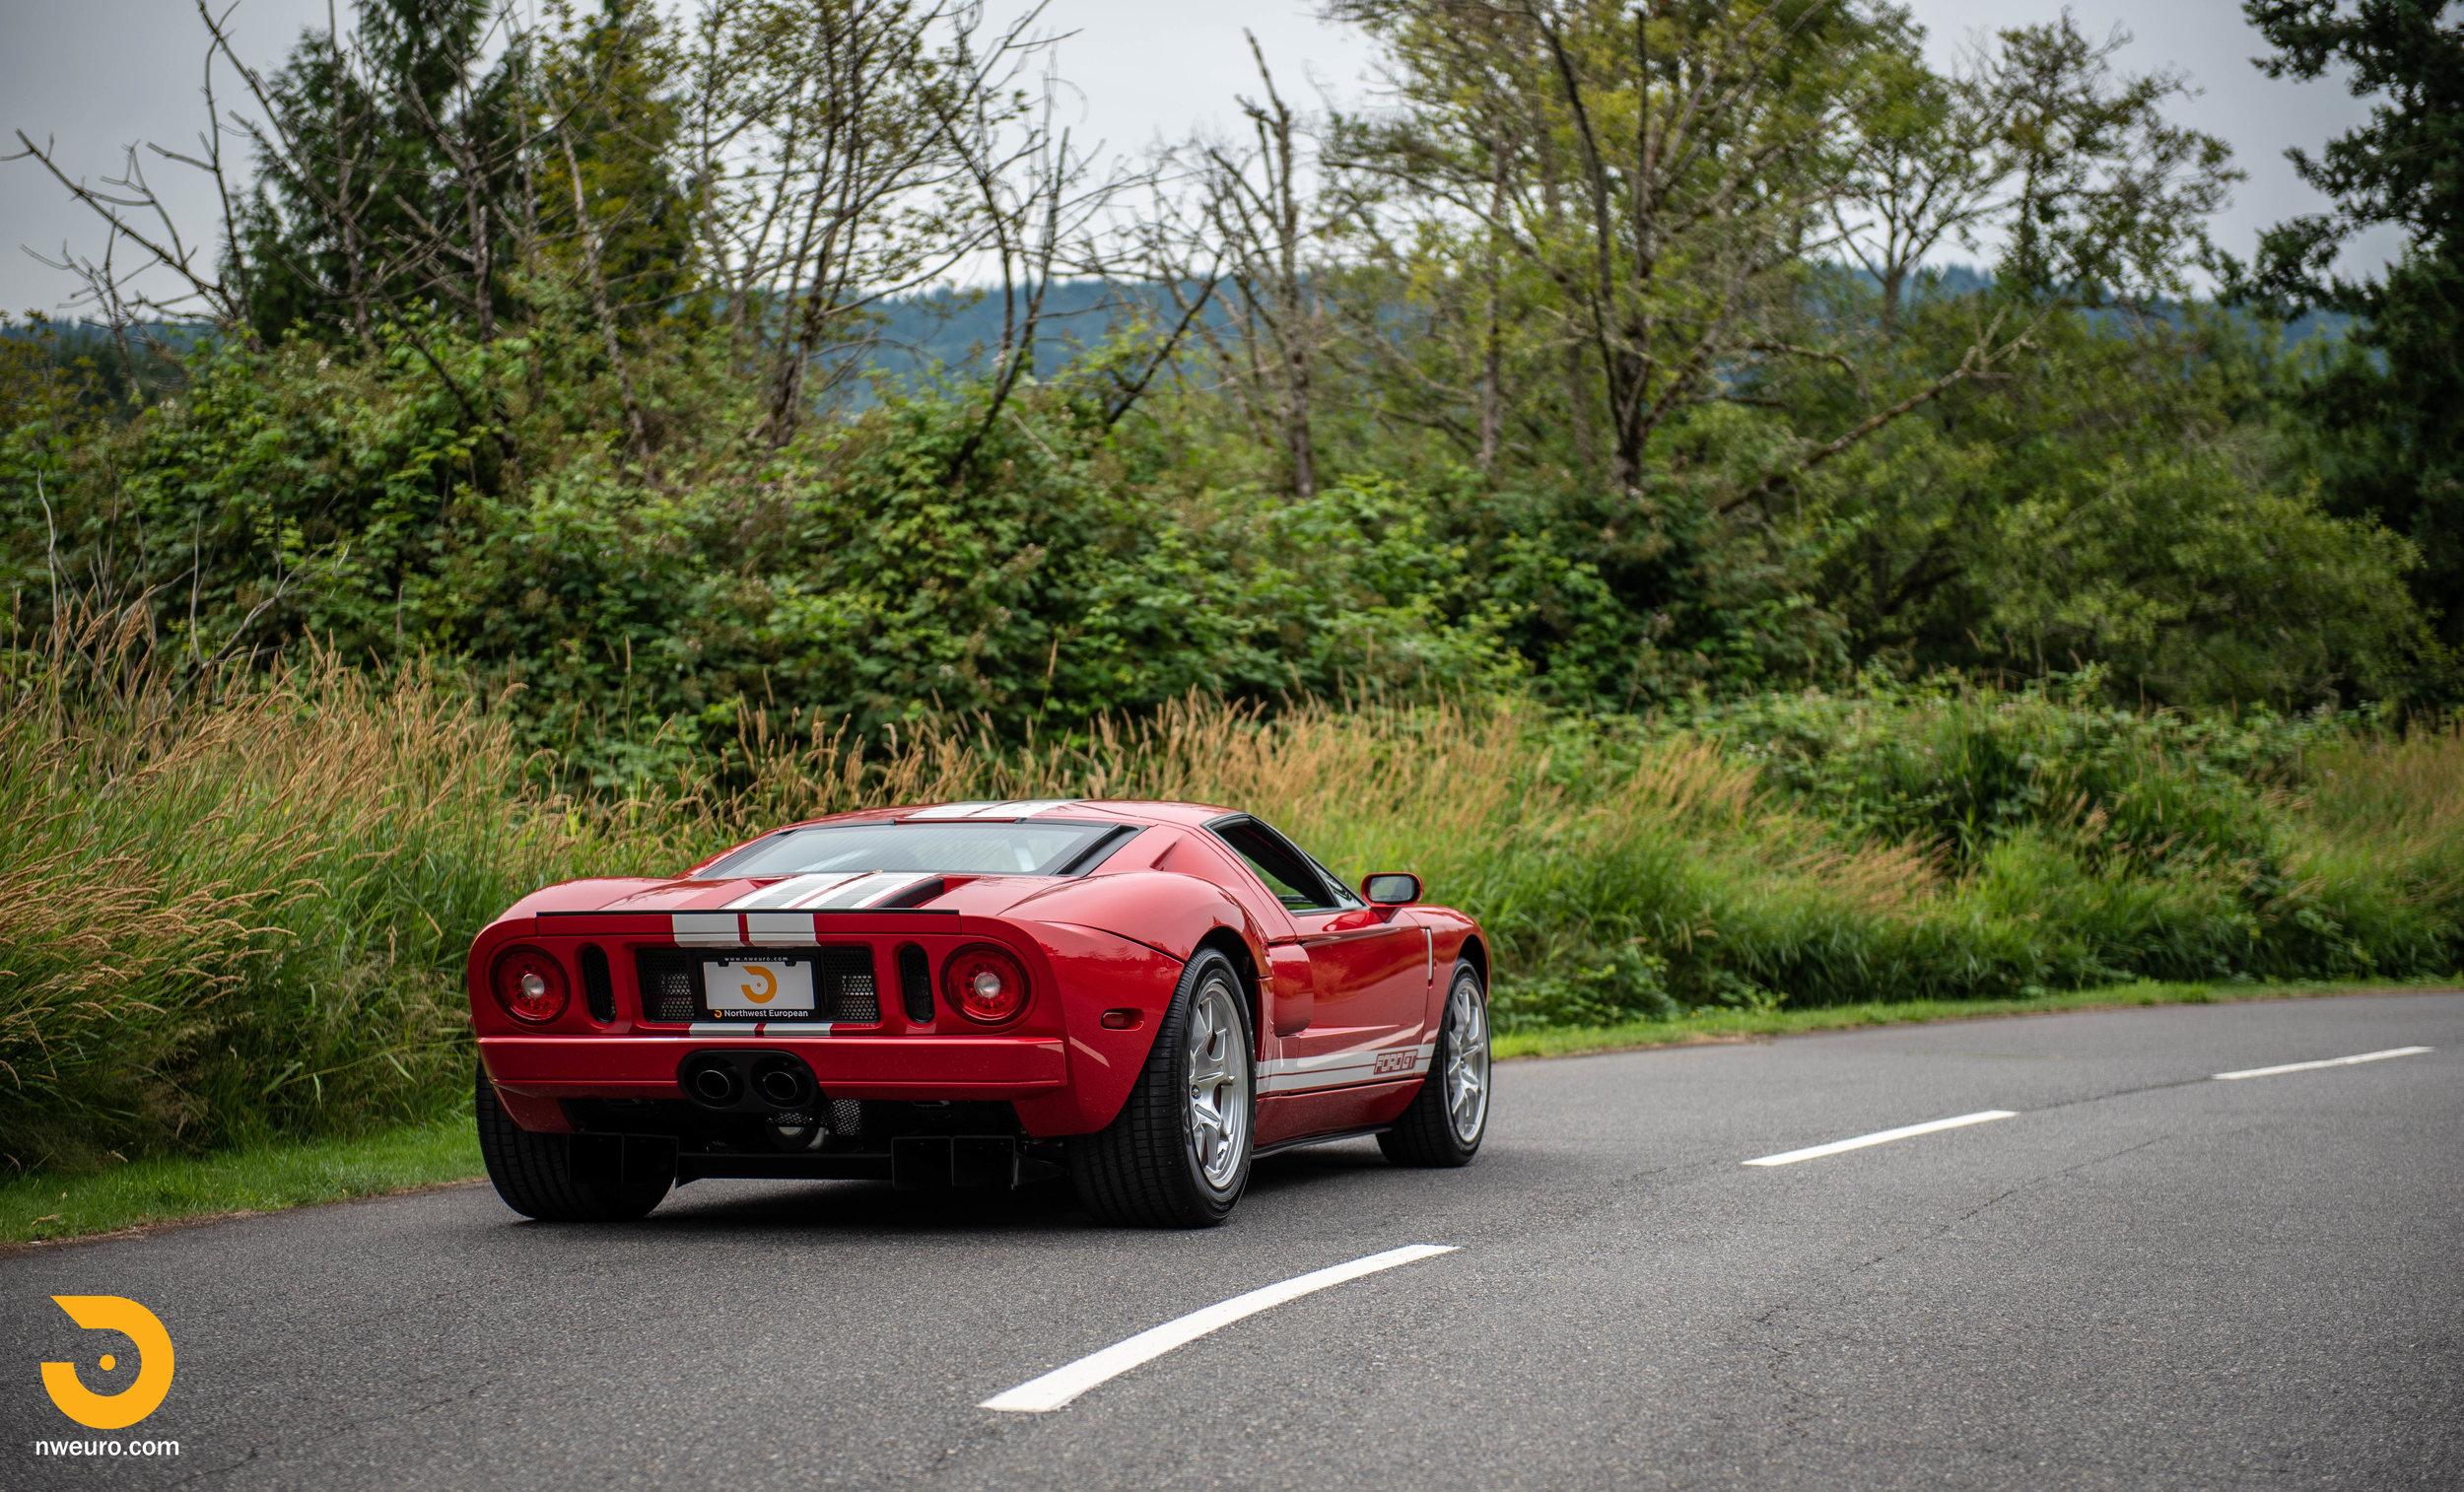 2005 Ford GT Red-82.jpg